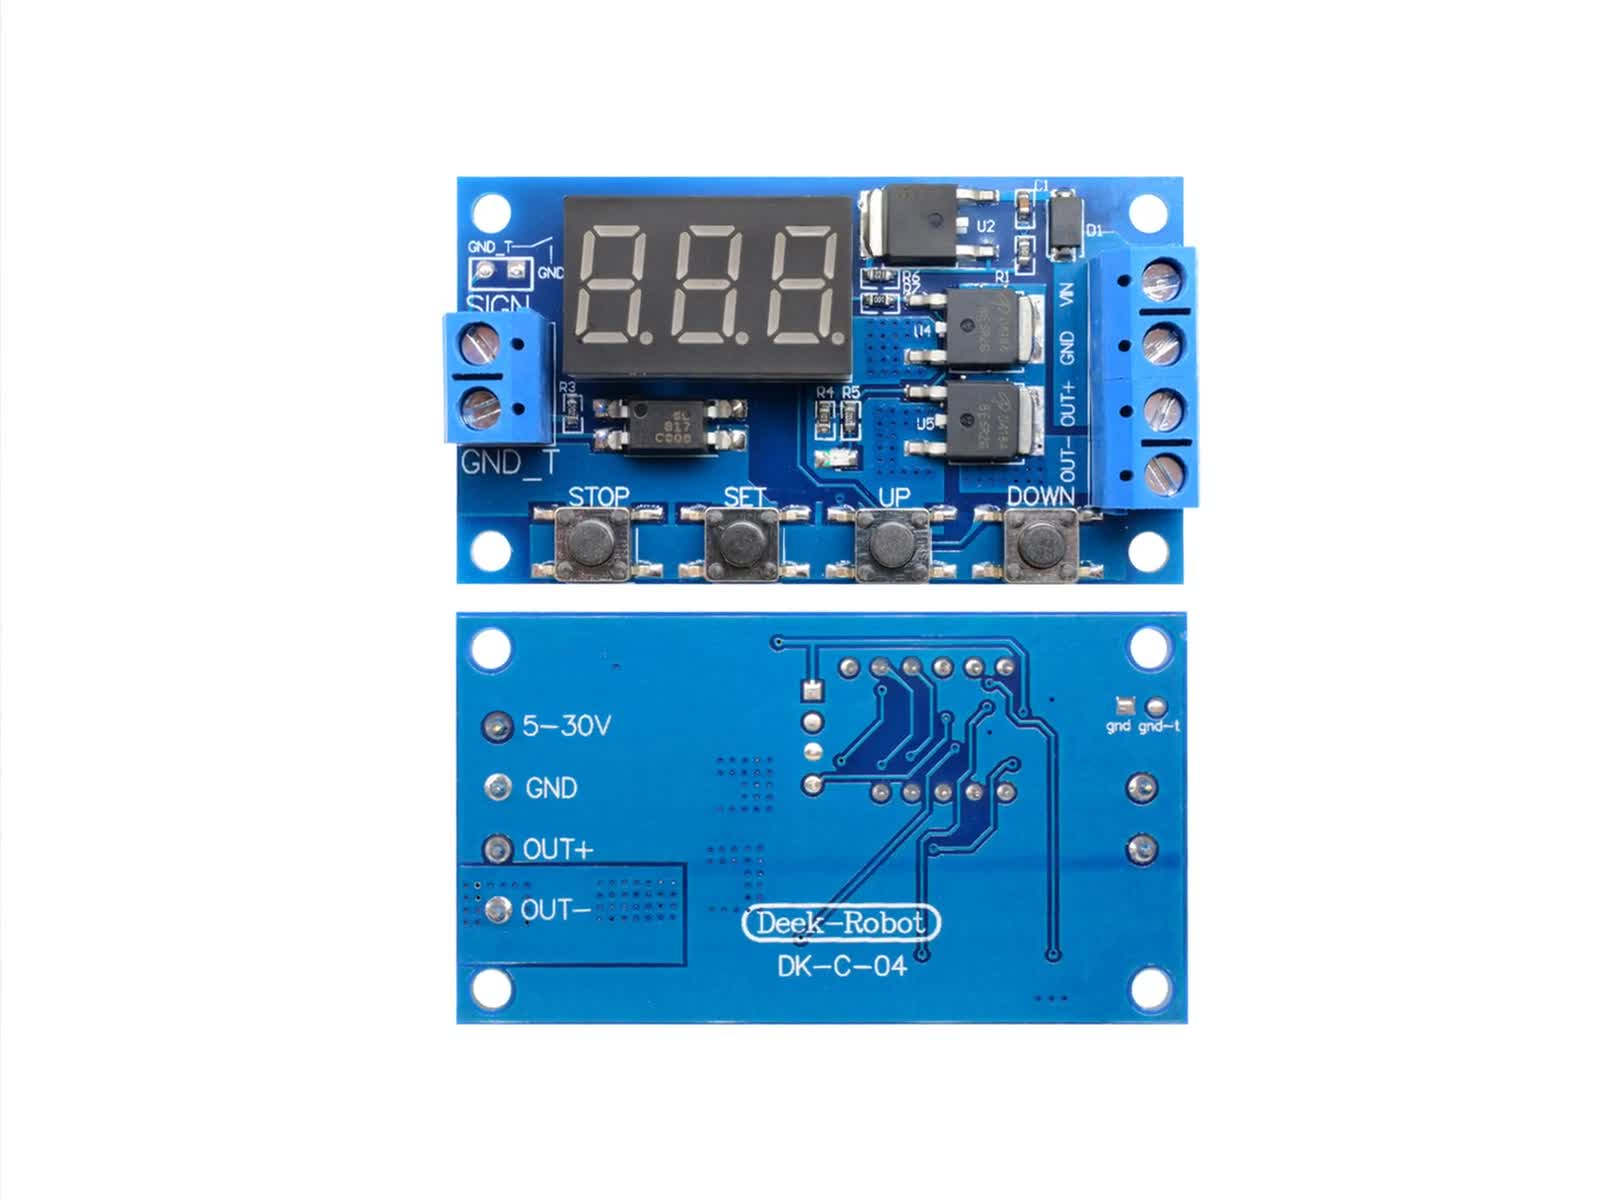 Trigger Cyclus Timer Vertraging Schakelaar 12 24 V Printplaat Dual MOS Buis Controle Module Relaismodule